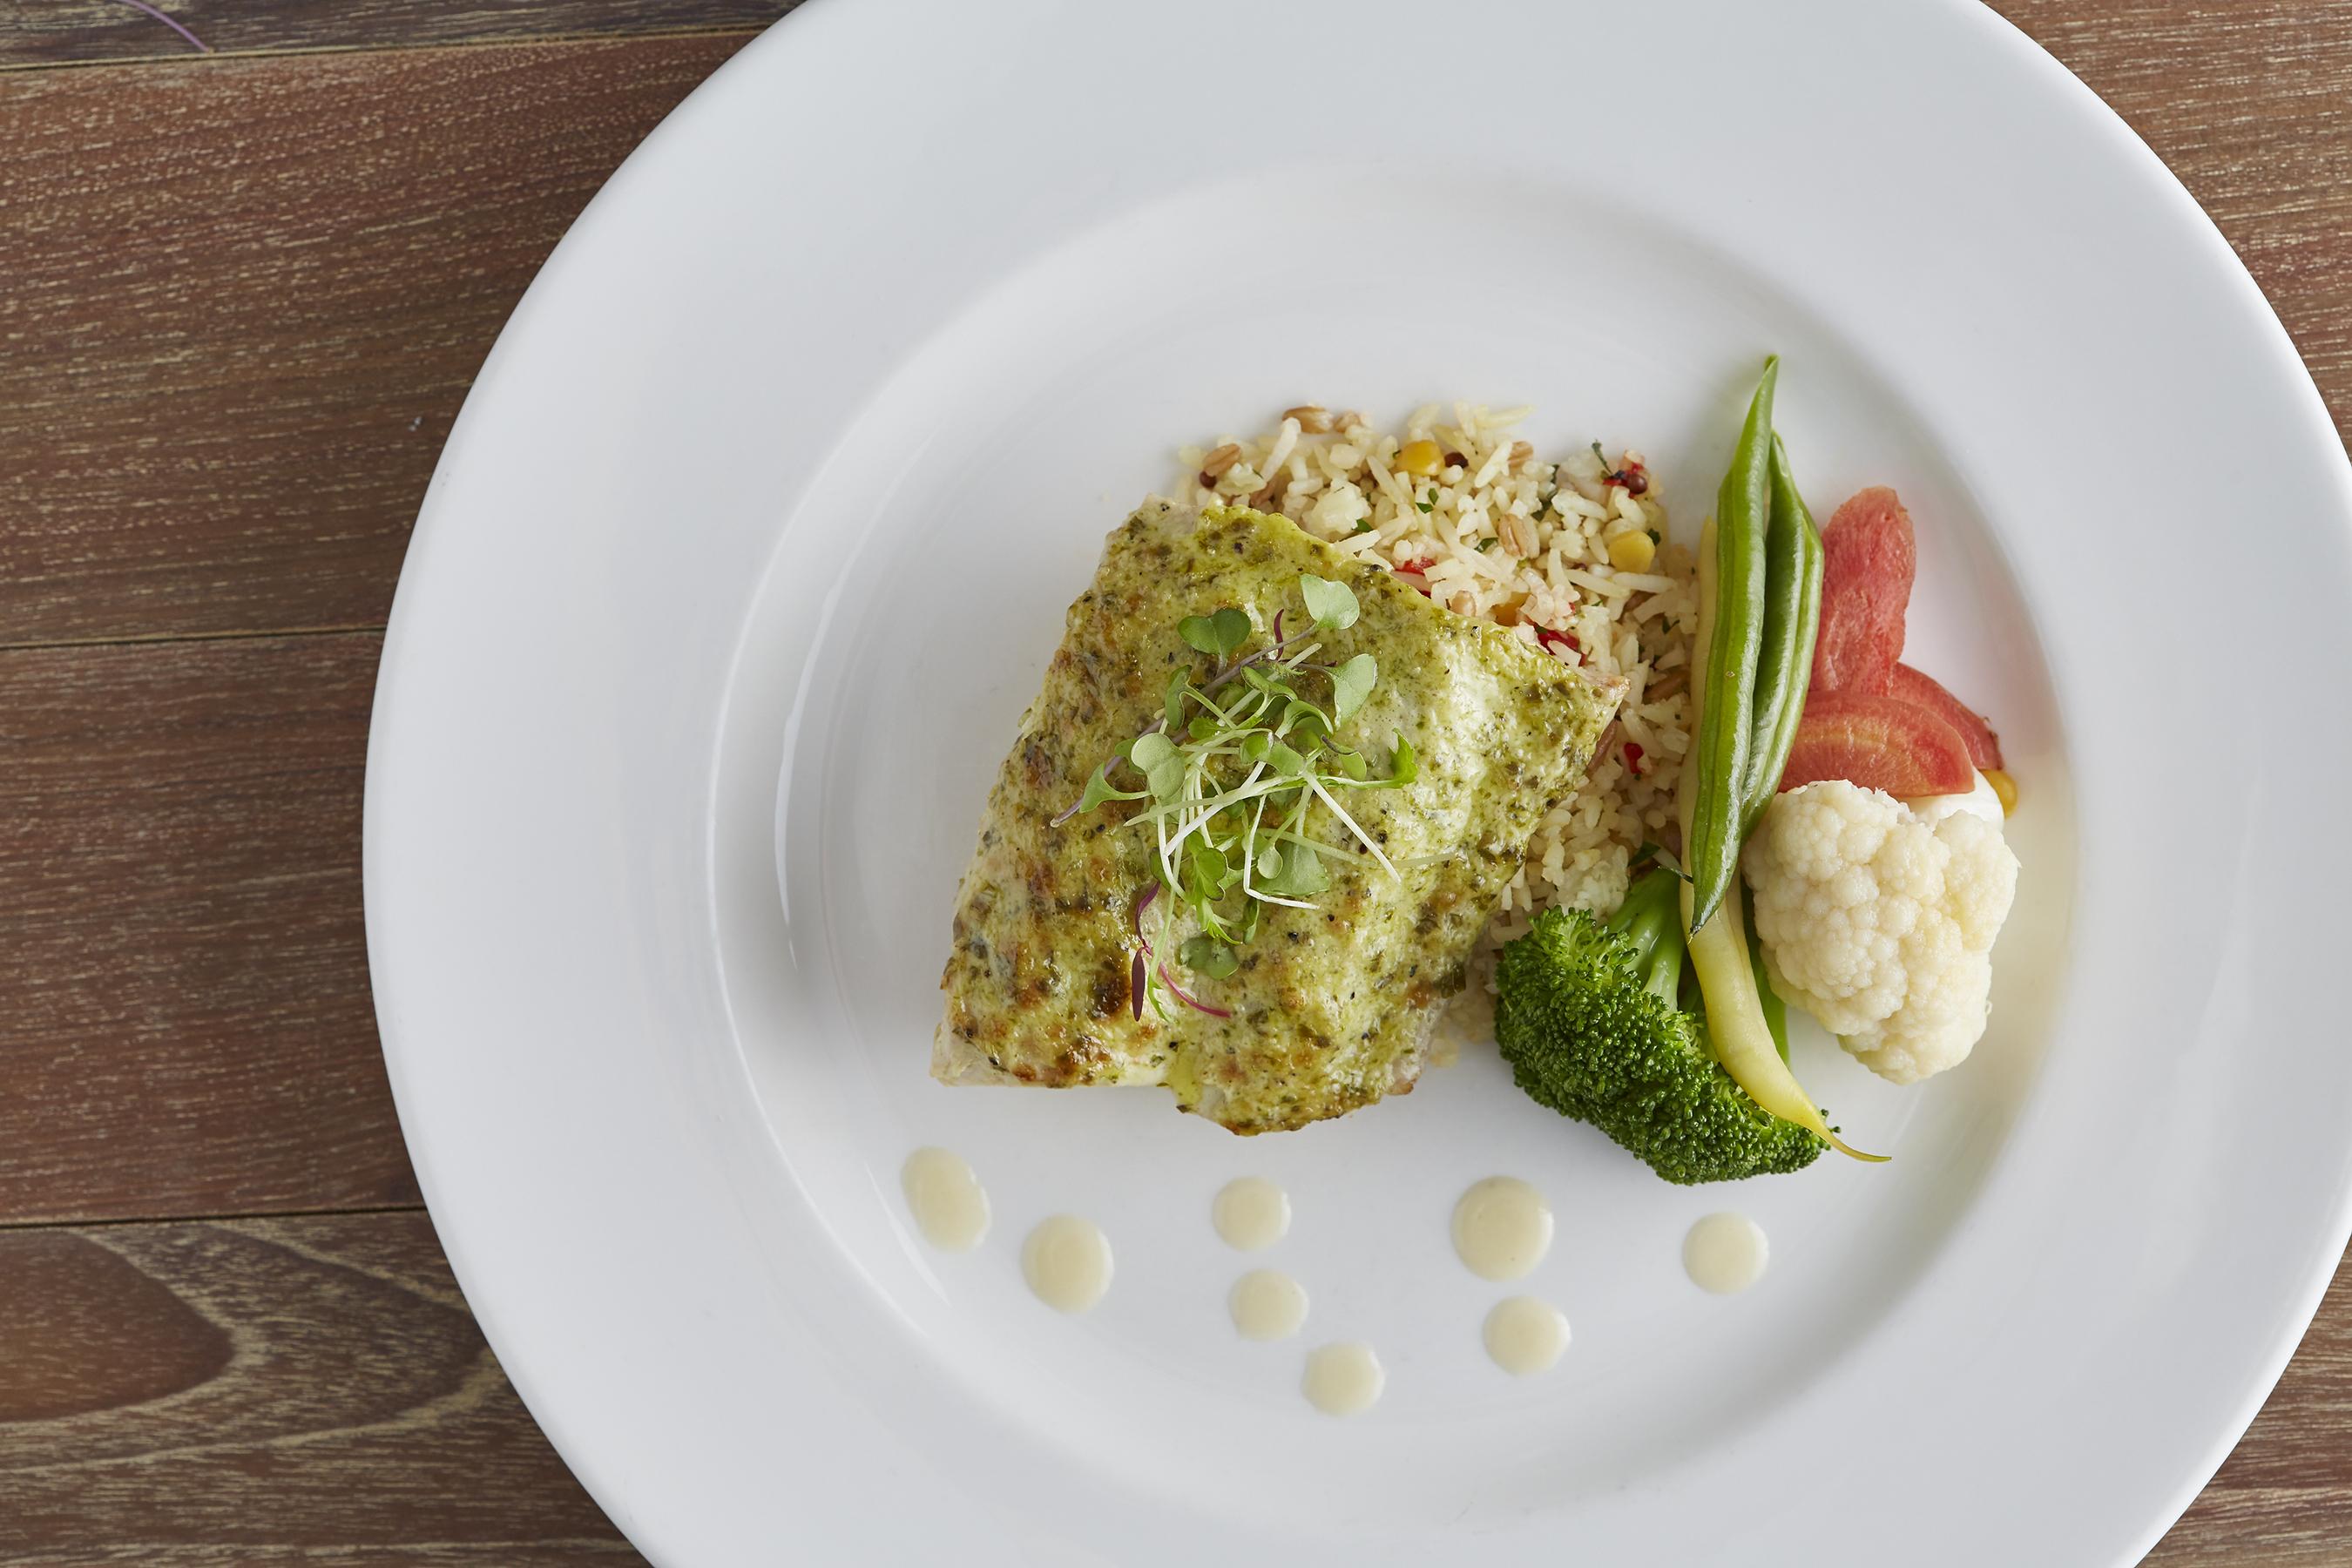 Duke's Beach House Announces Chef's Tasting Menu